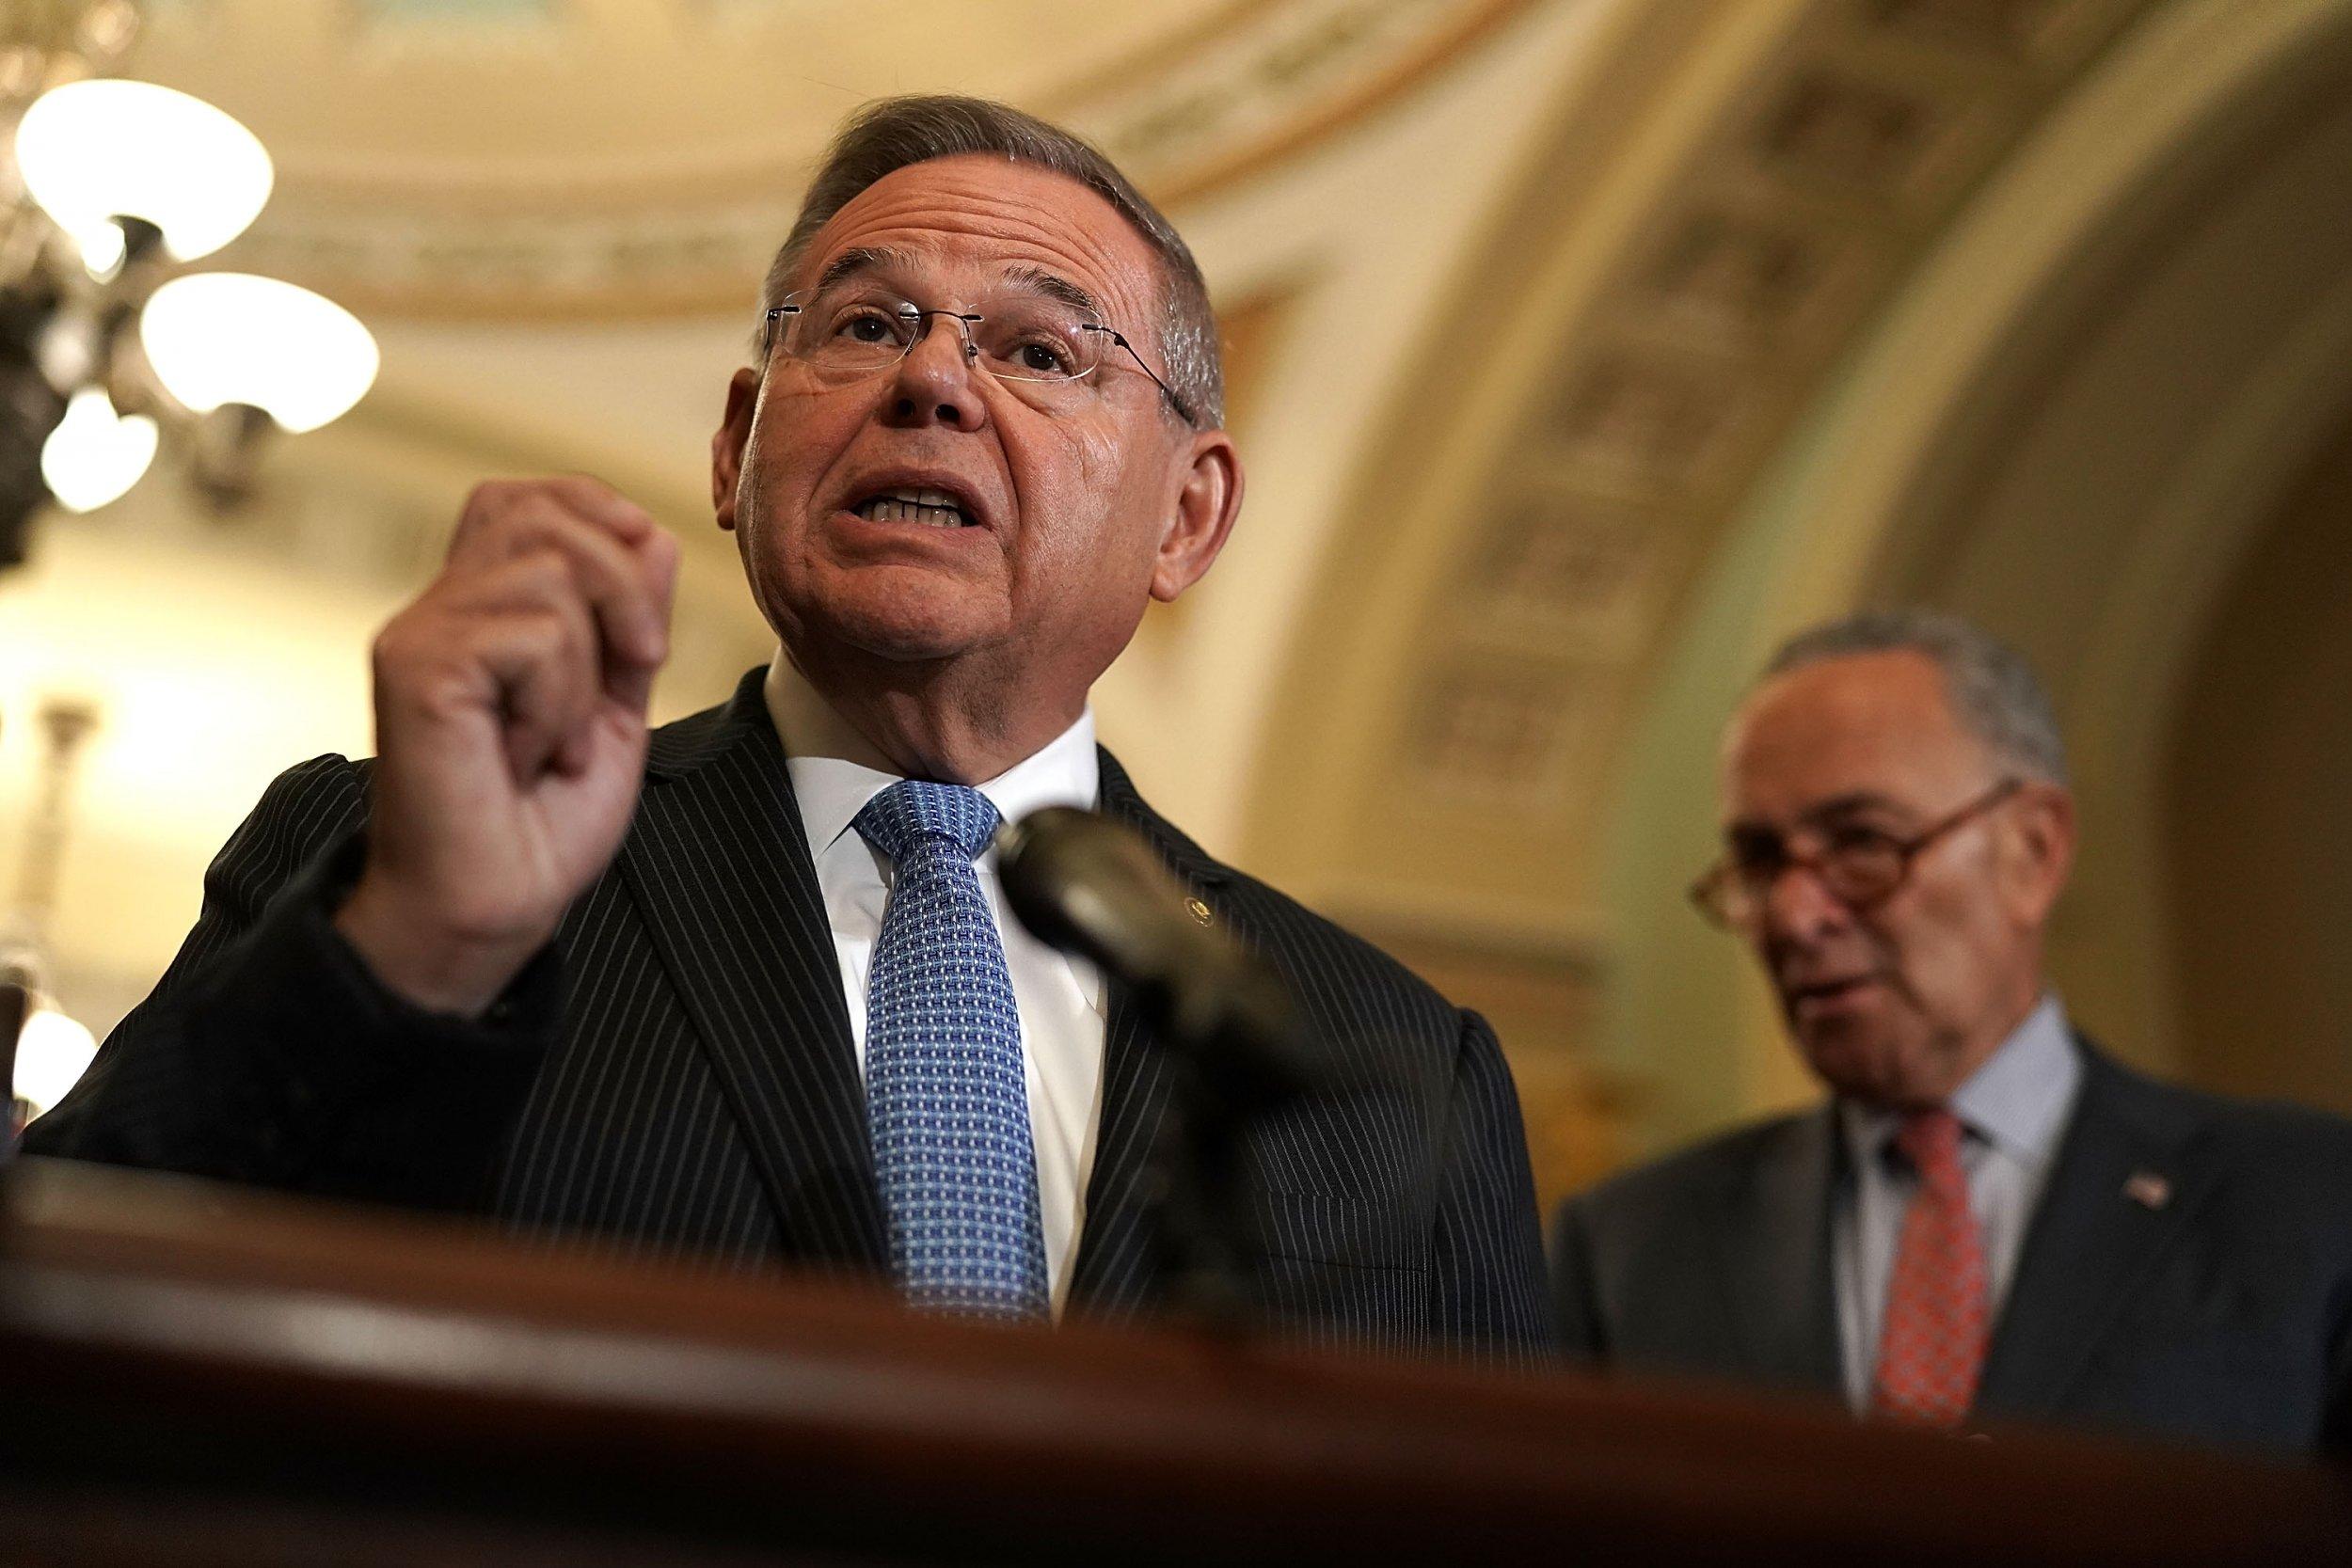 Democratic Senator Calls FBI Report on Kavanaugh 'Bullshit' Investigation